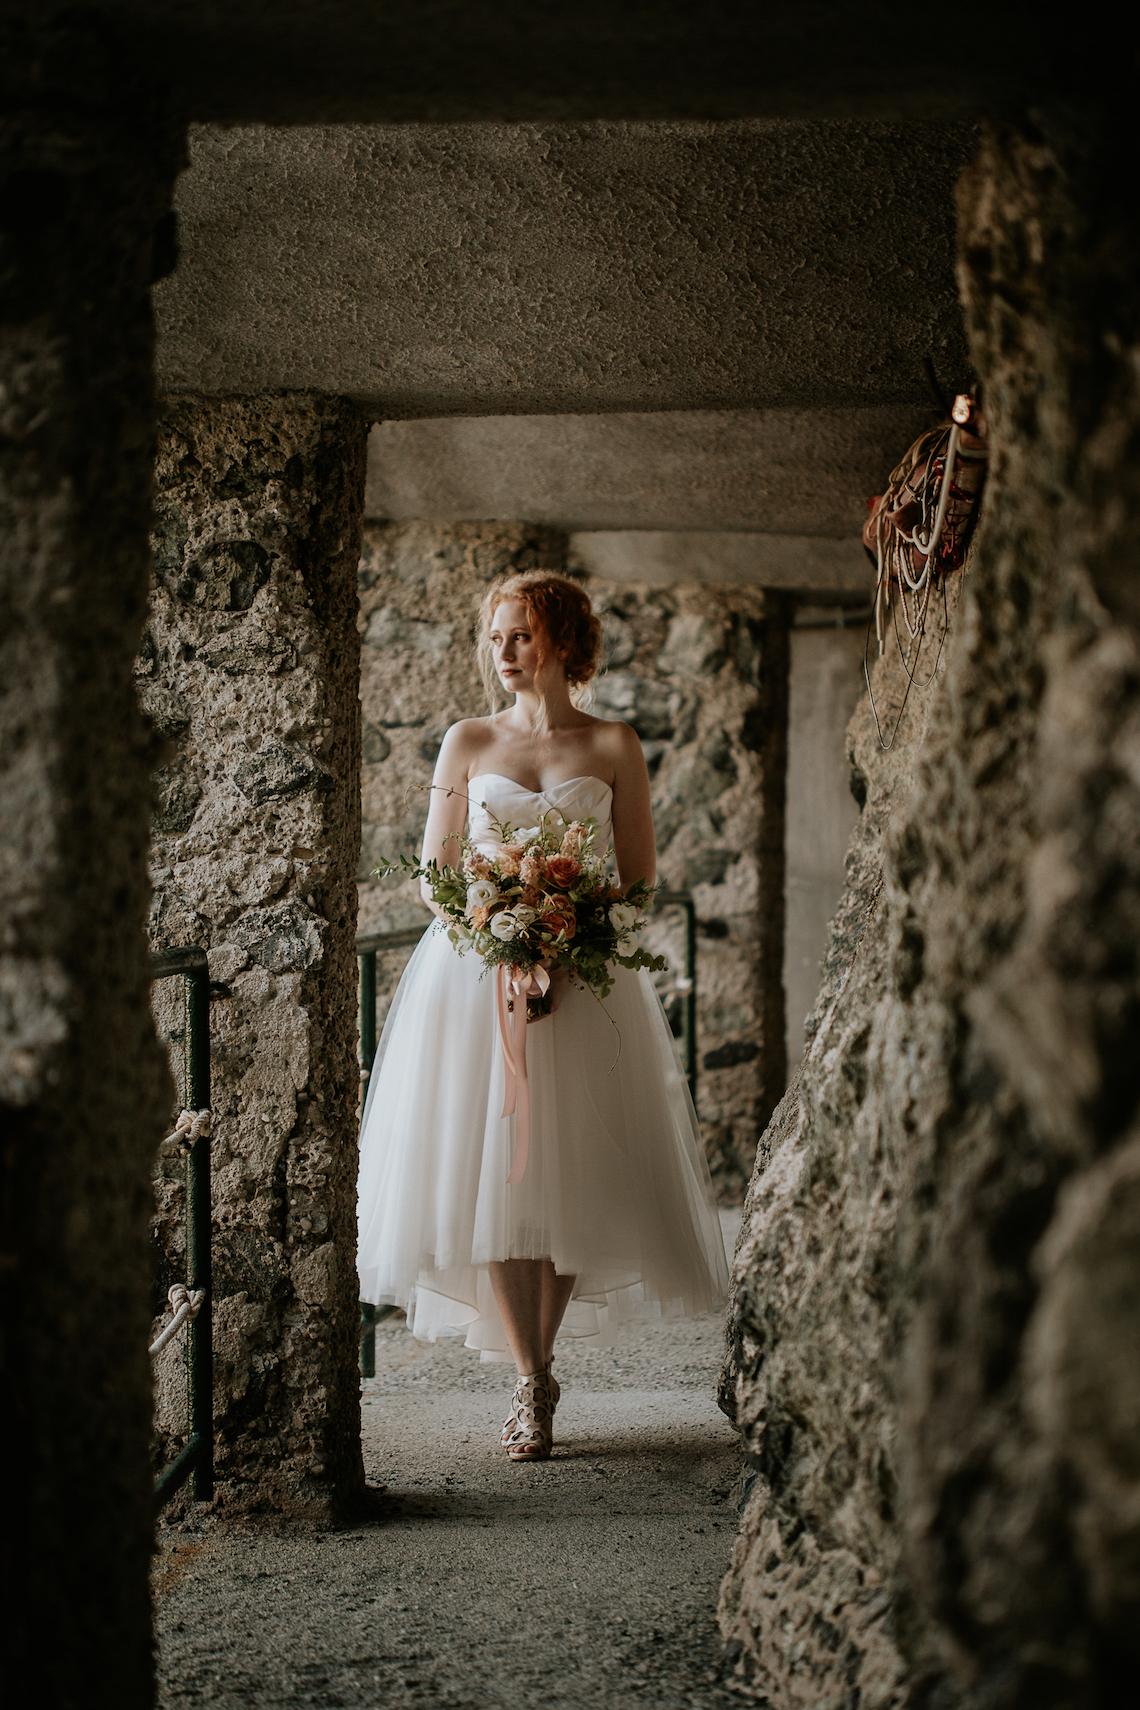 Rose Gold and Copper Cinque Terre Fall Wedding Inspiration – Di Luce e d Ombra – Greta Betton Wedding Planner 12